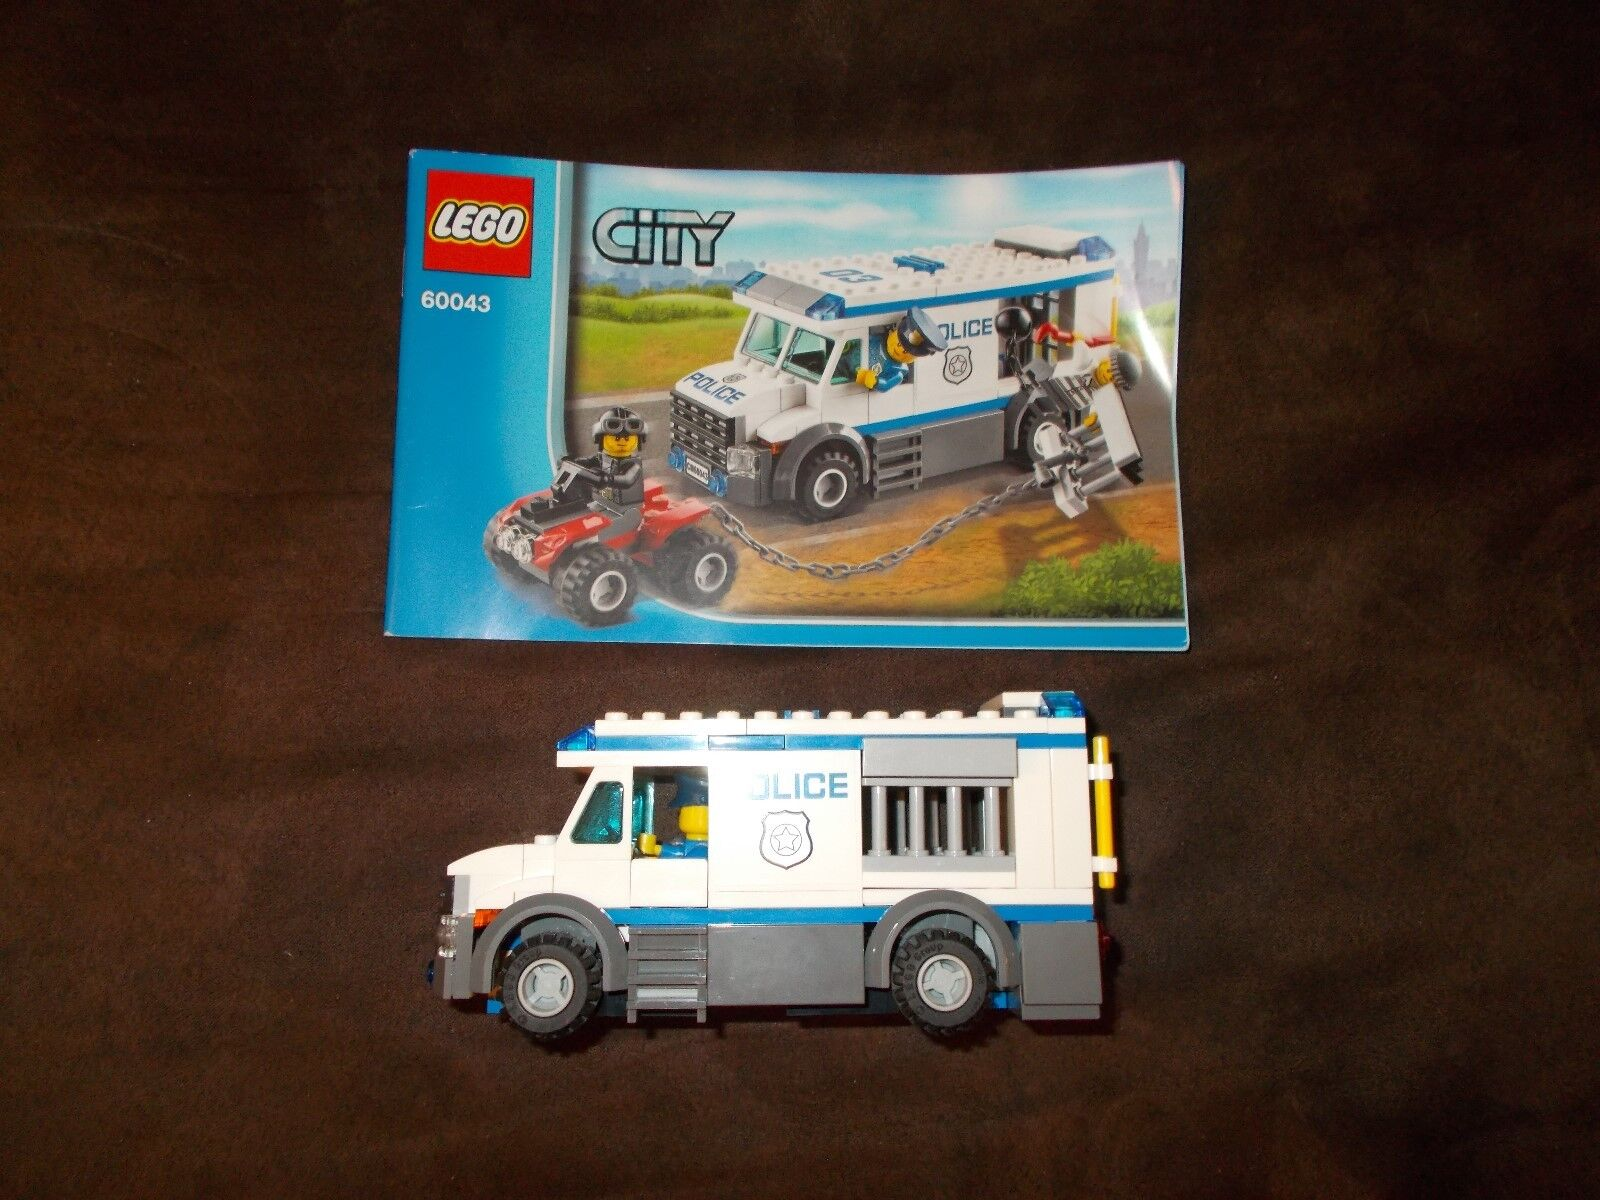 Lego® City - Polizei Konvolut - 3 Sets - 60043, 4436, 7285 mit Bauanleitung (BA)